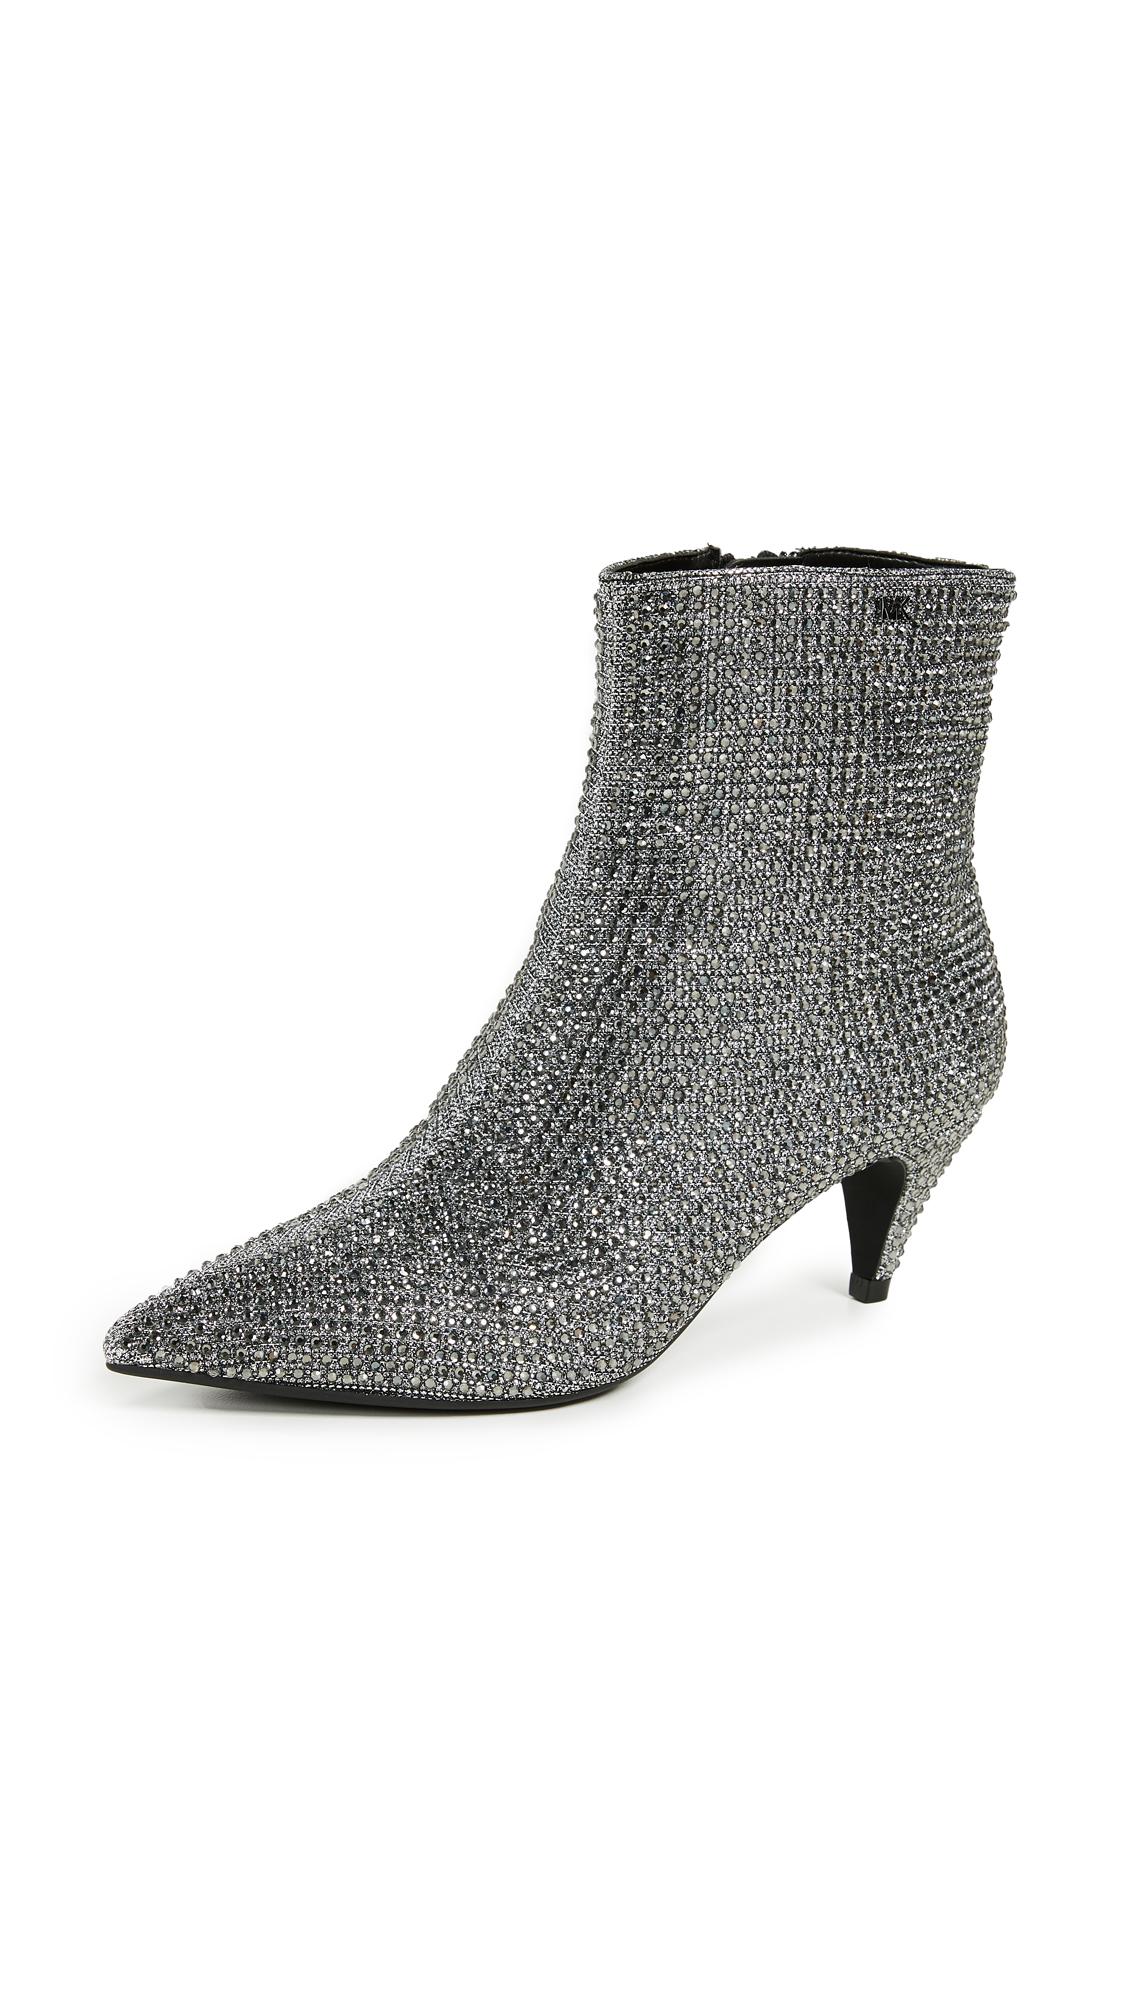 MICHAEL Michael Kors Blaine Flex Kitten Heel Booties - Black/Silver